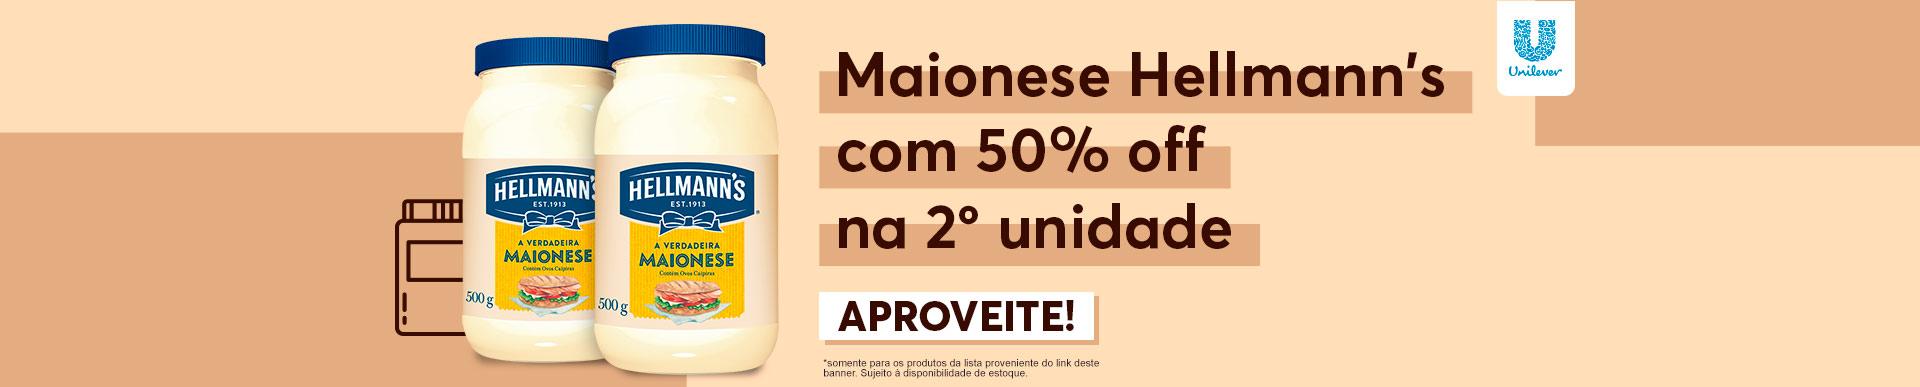 Unilever hellmans